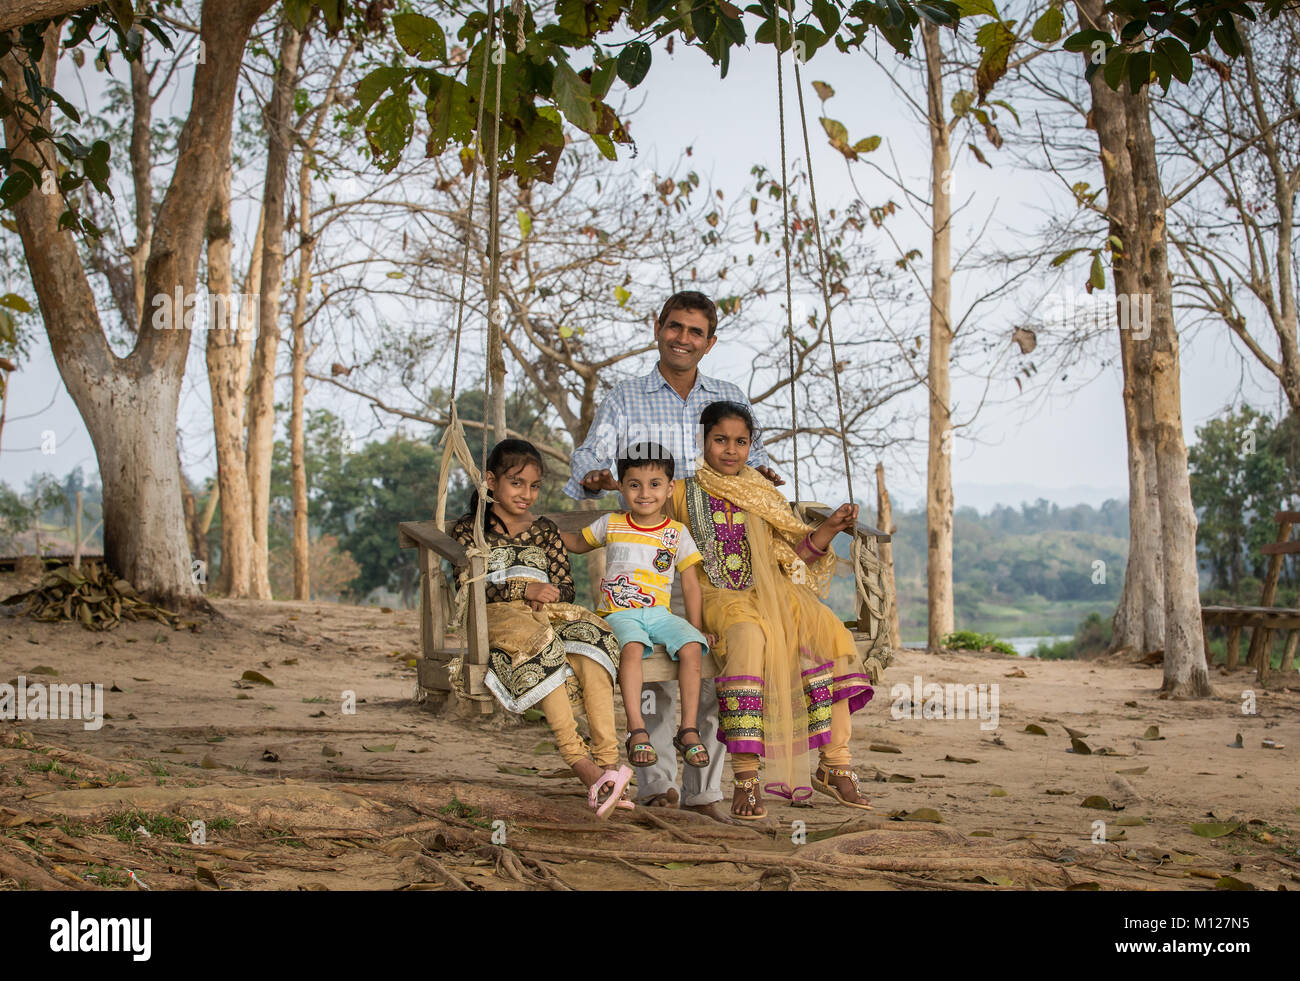 Bangladeshi family on a swing - Stock Image